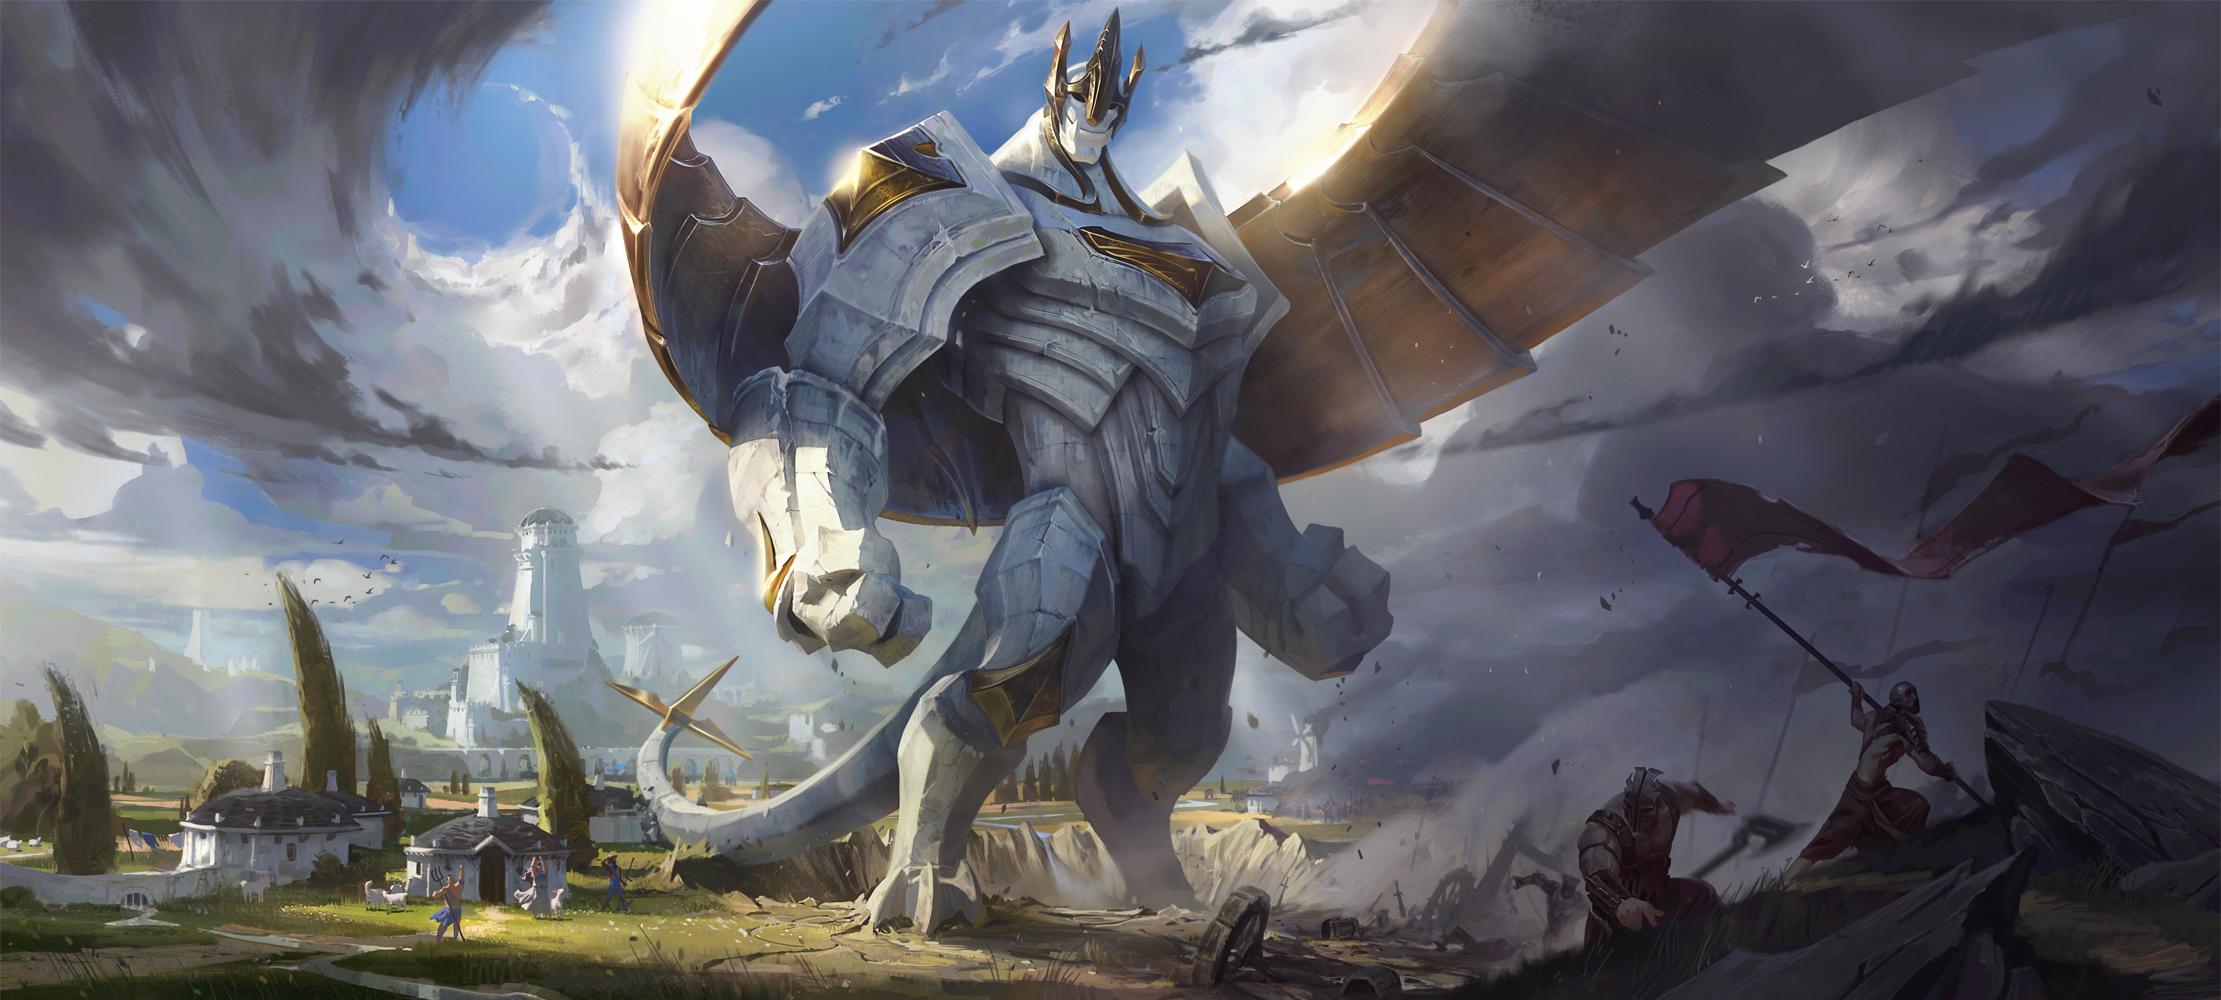 Galio, the Colossus